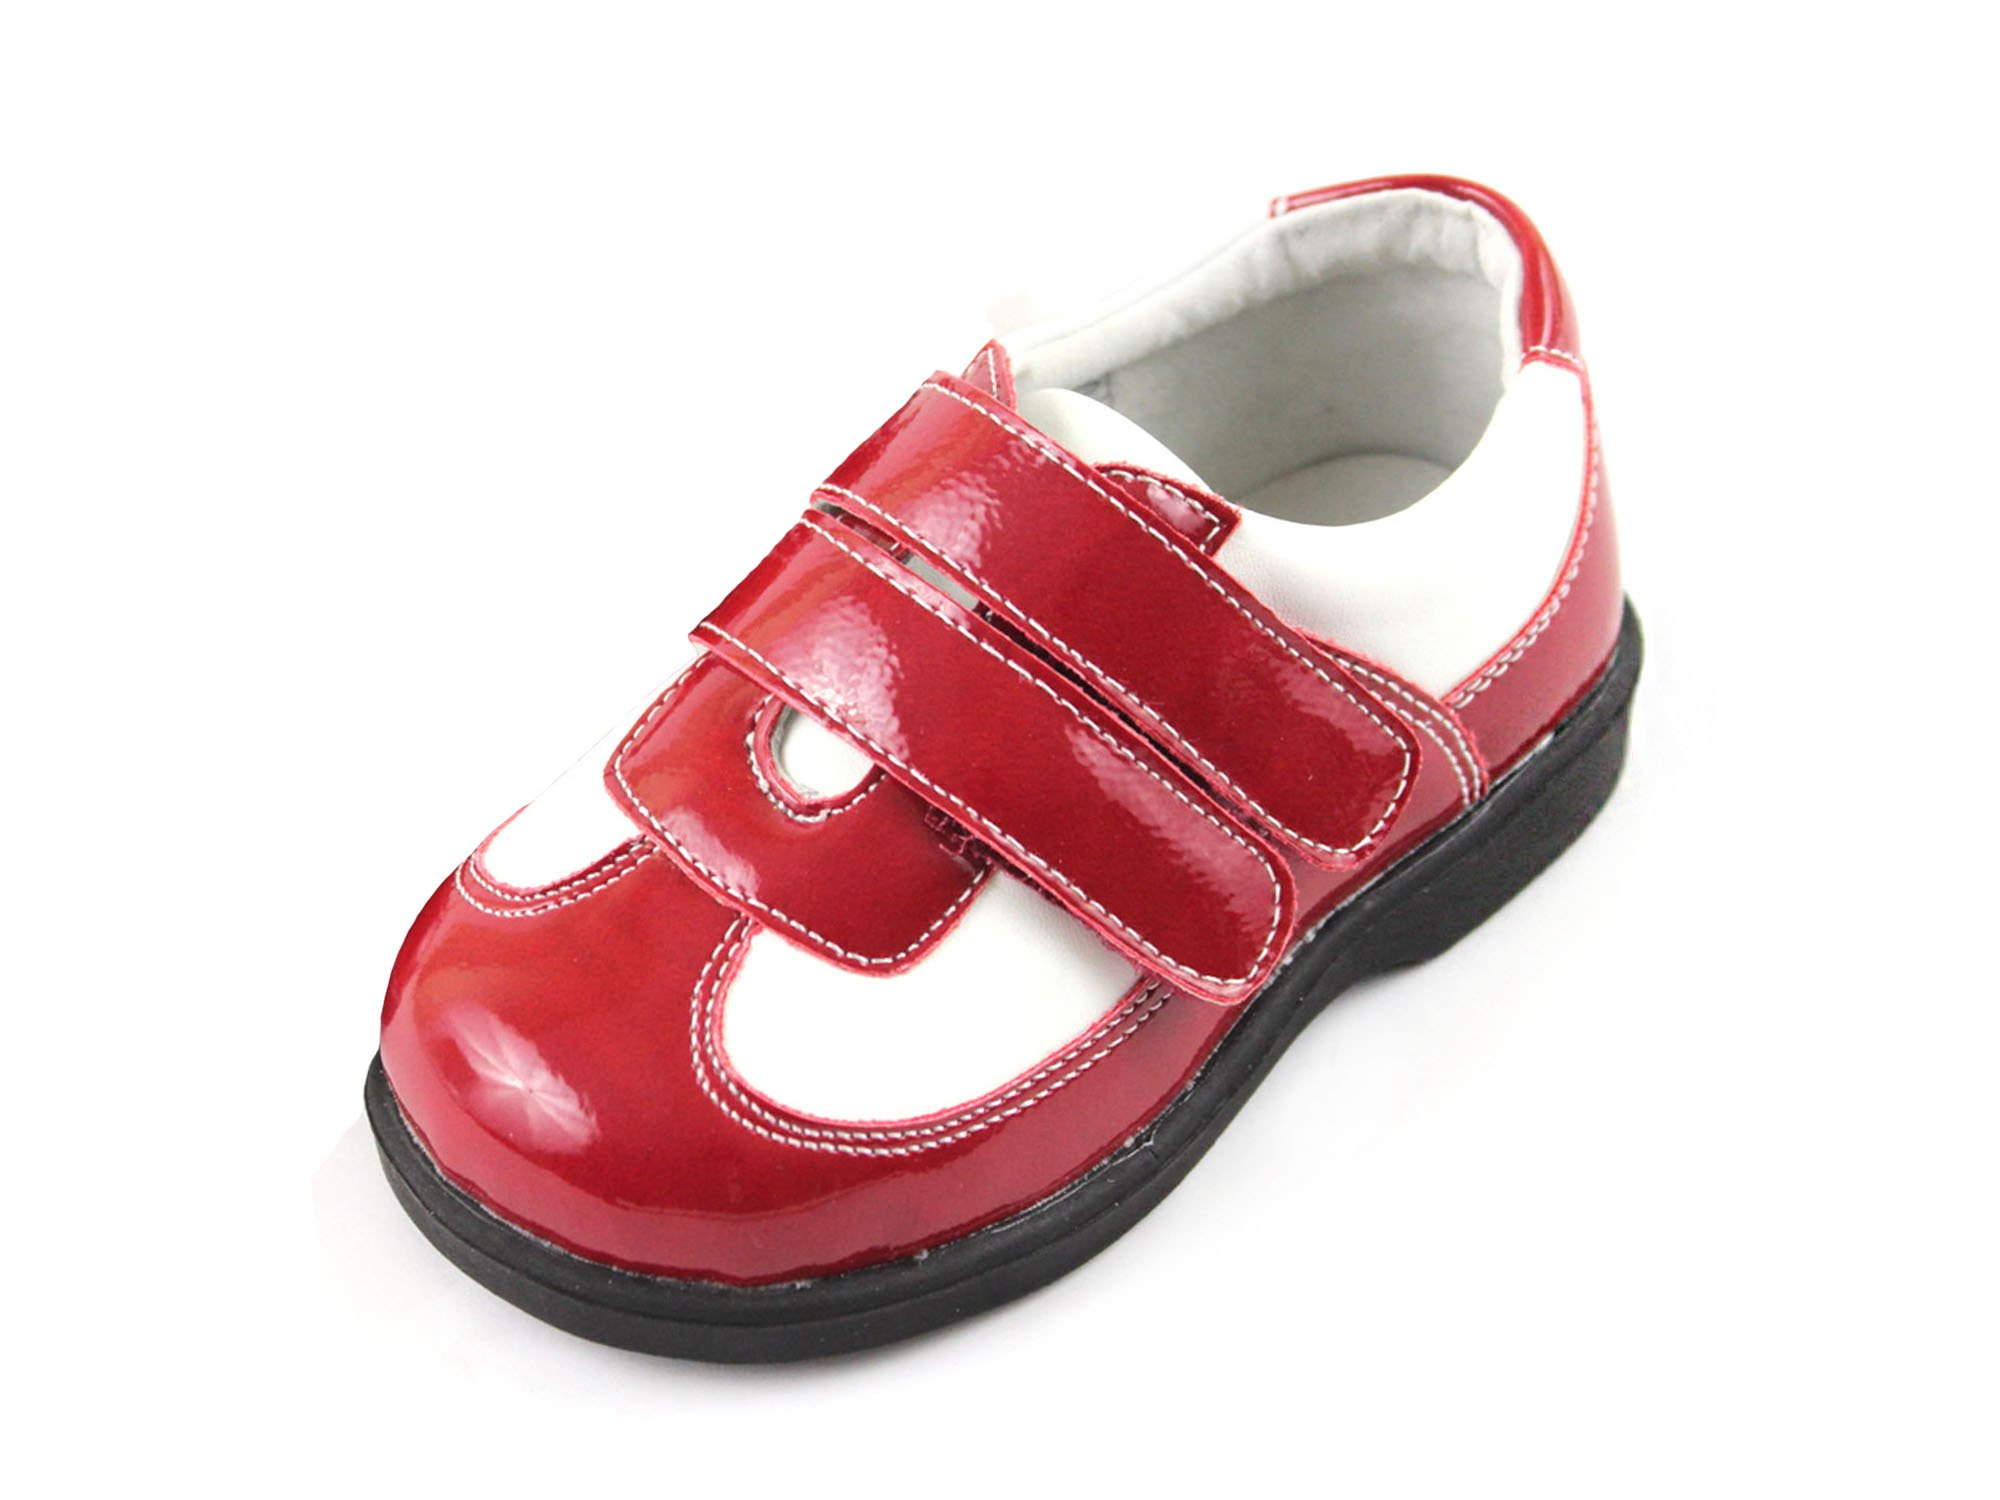 HLT Toddler/Little Kid Girl Double Strap Red Sport/Uniform Shoe [US 10 / EU 26]